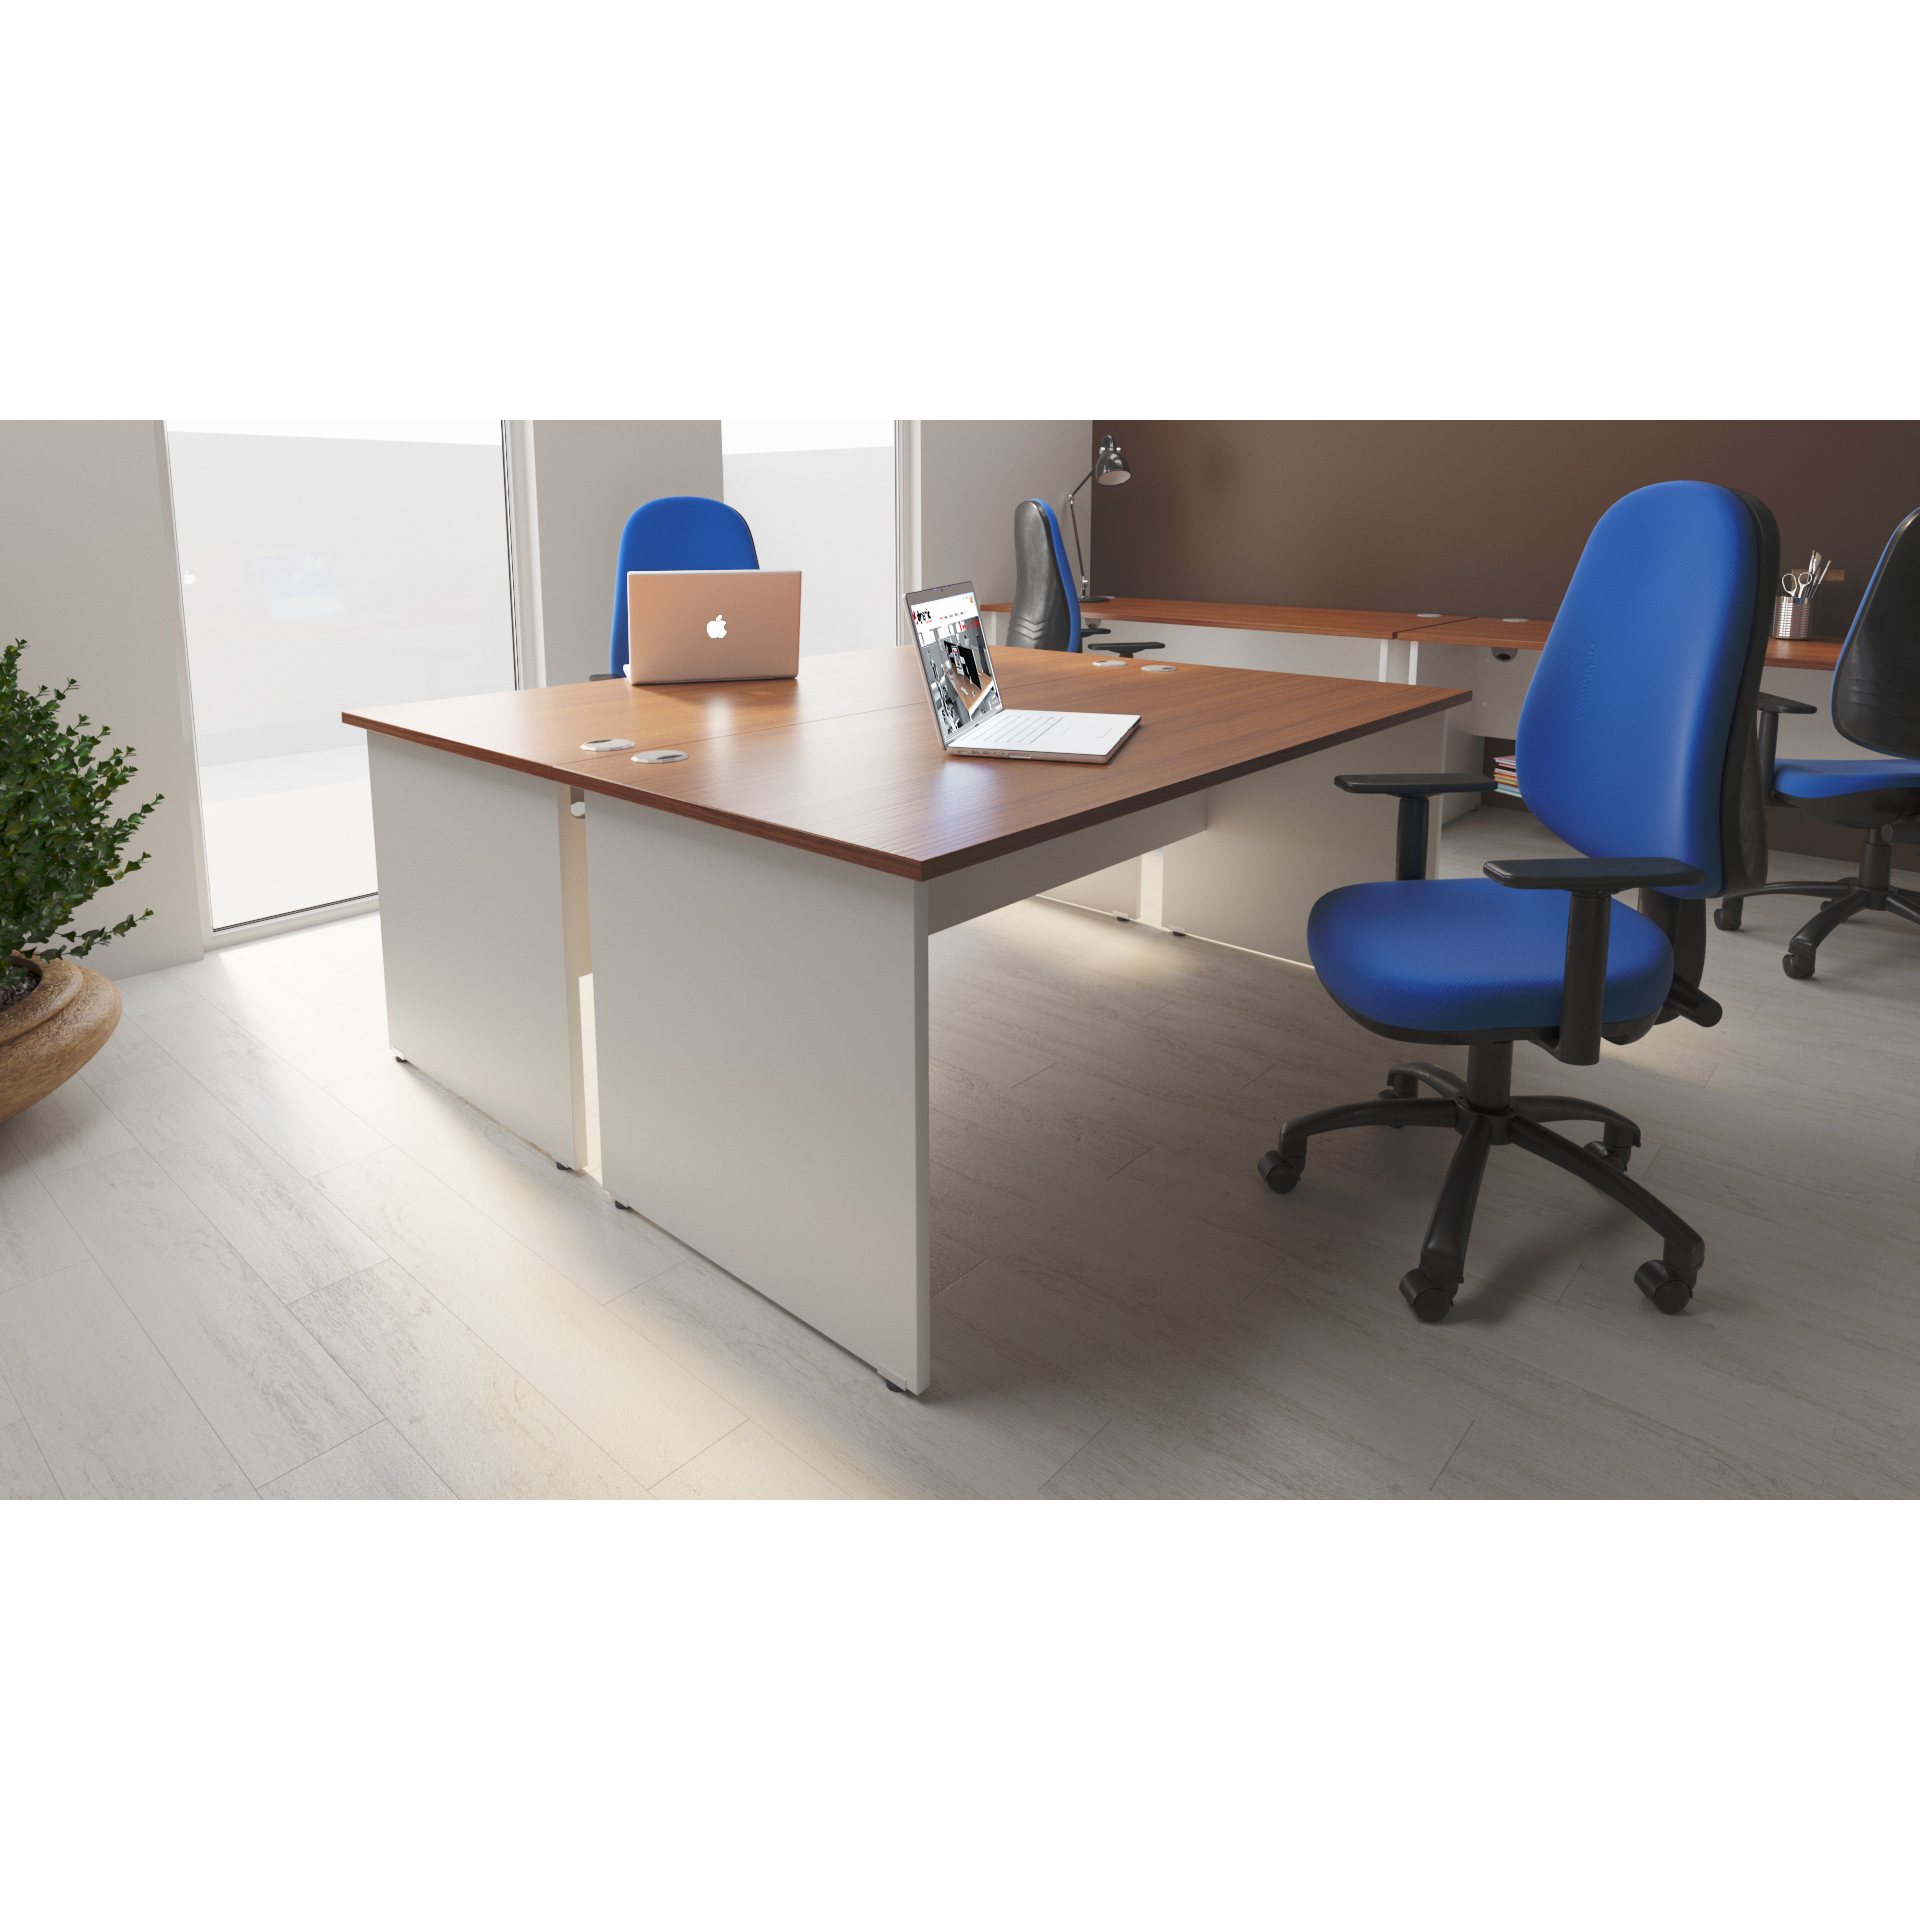 Trexus Desk Rectangle Panel End 1200x600mm Walnut Top White Panels Ref TT000085